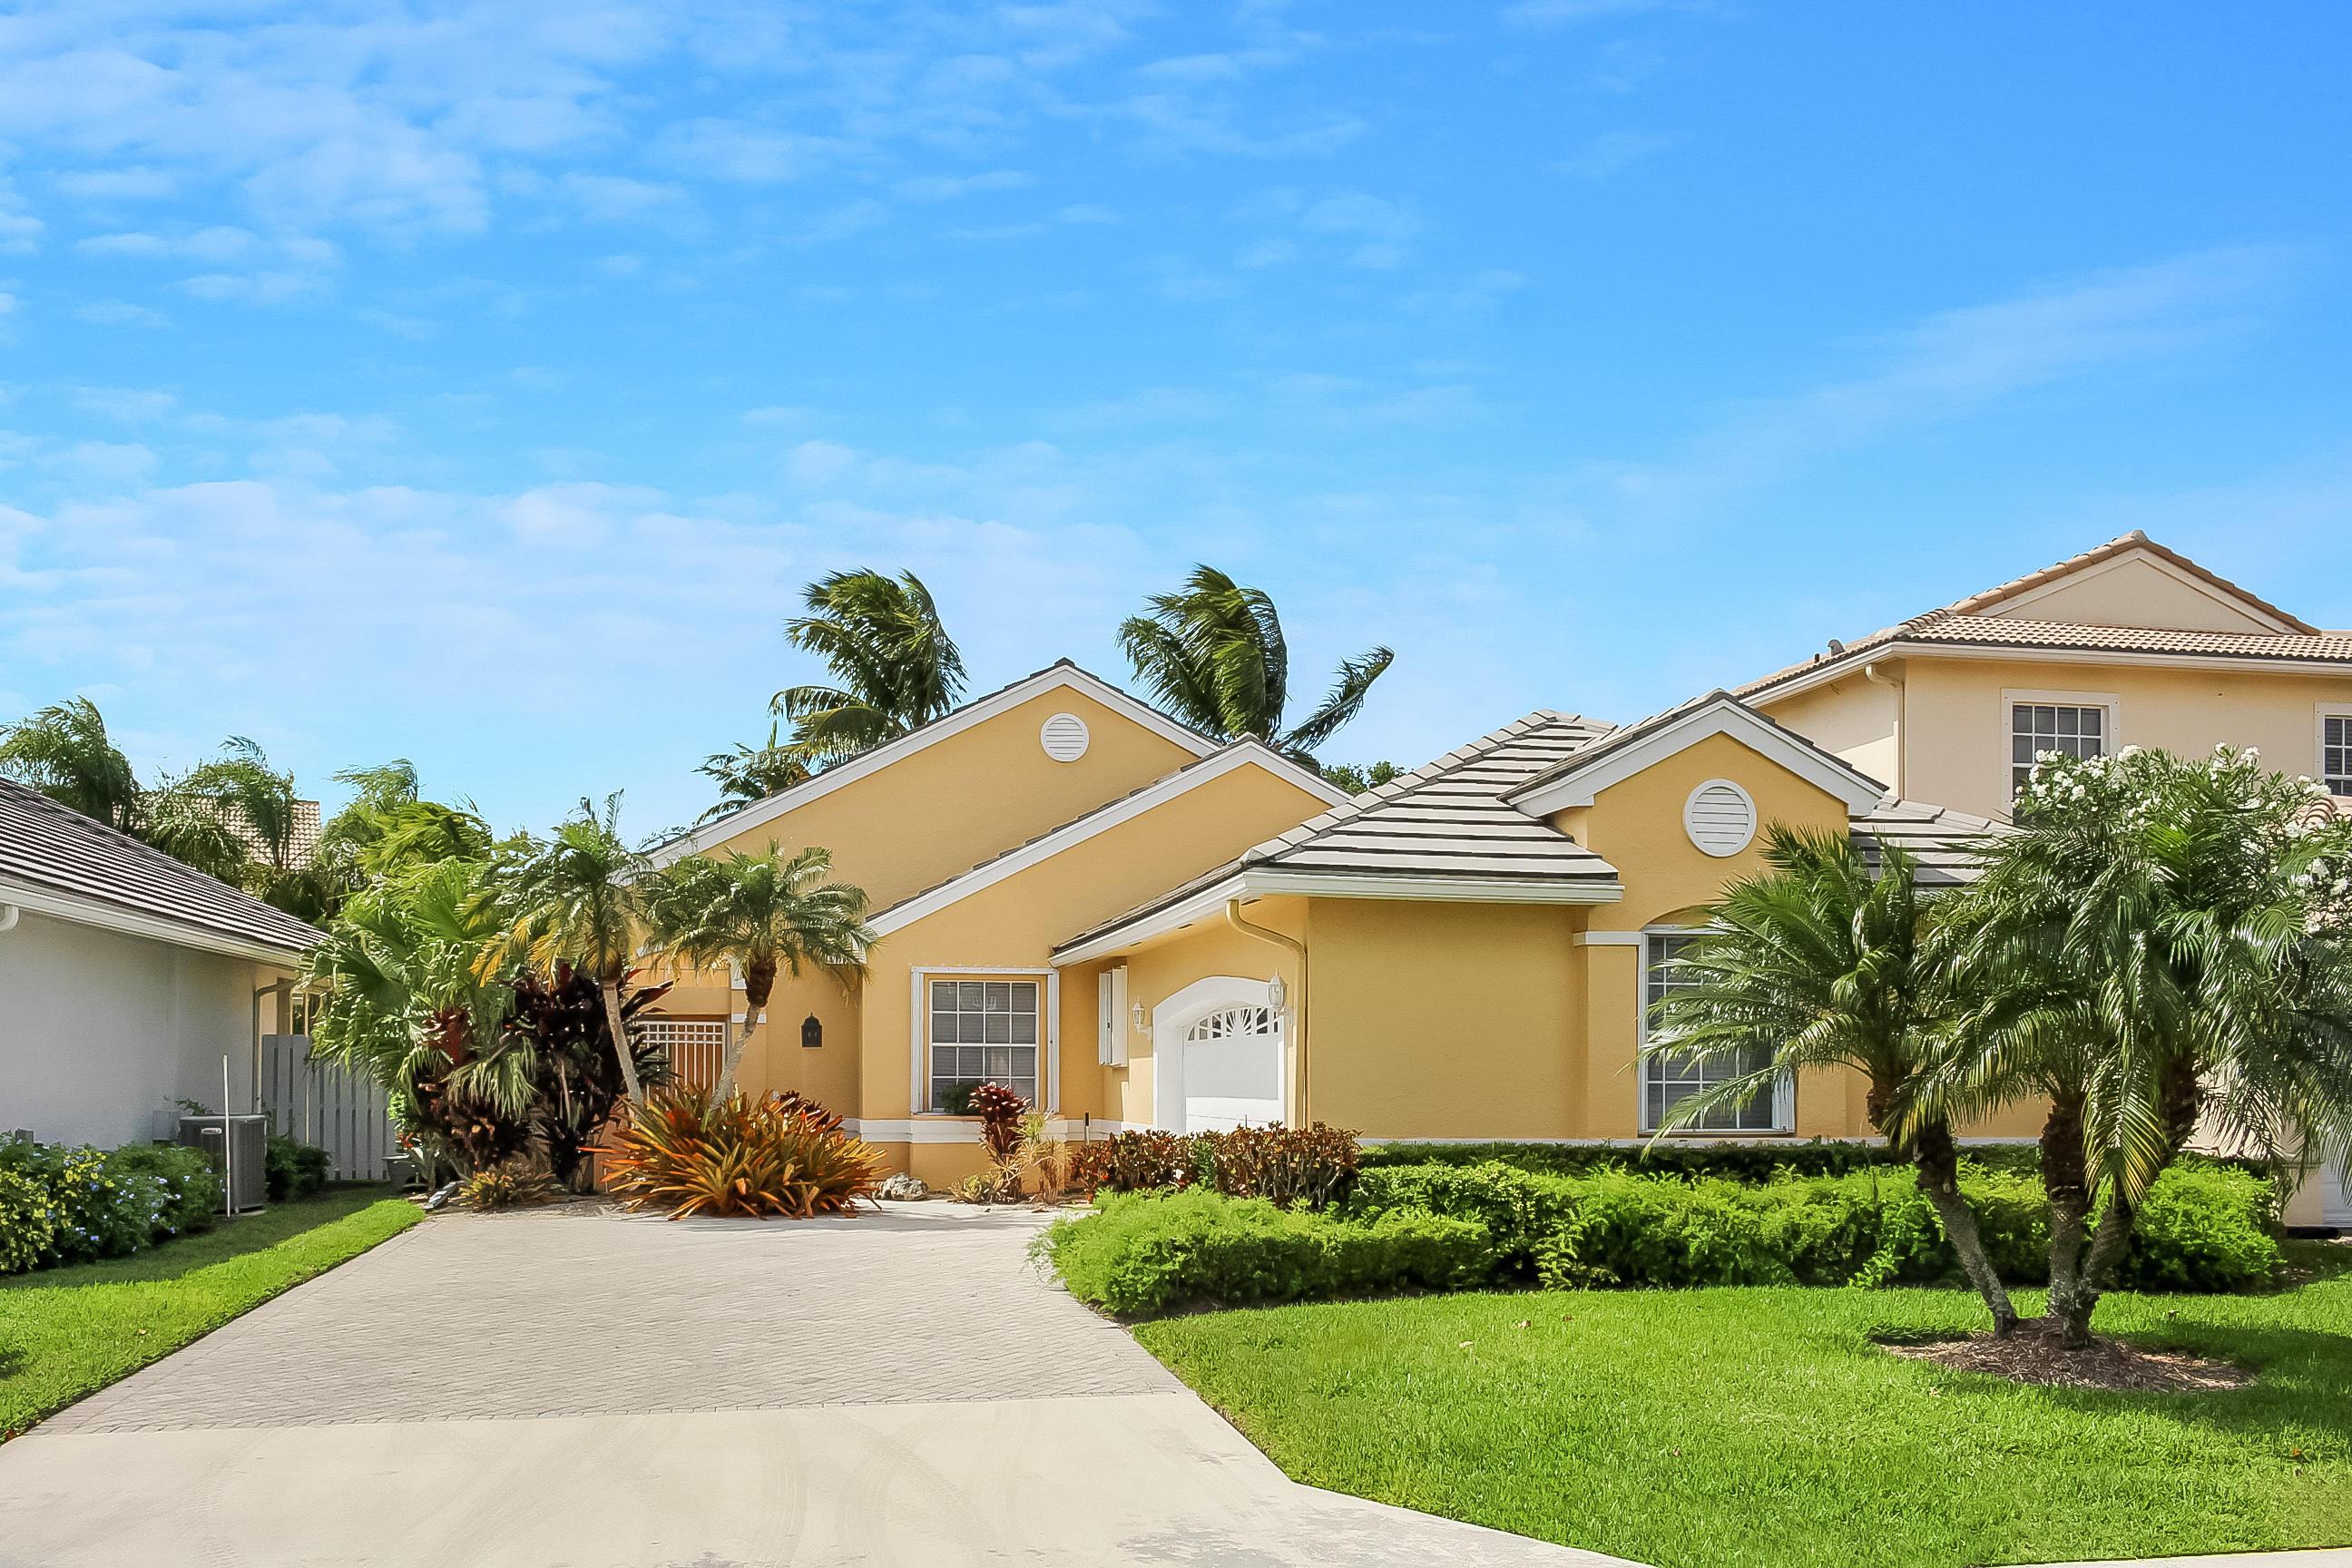 8273 Bob O Link Drive West Palm Beach, FL 33412